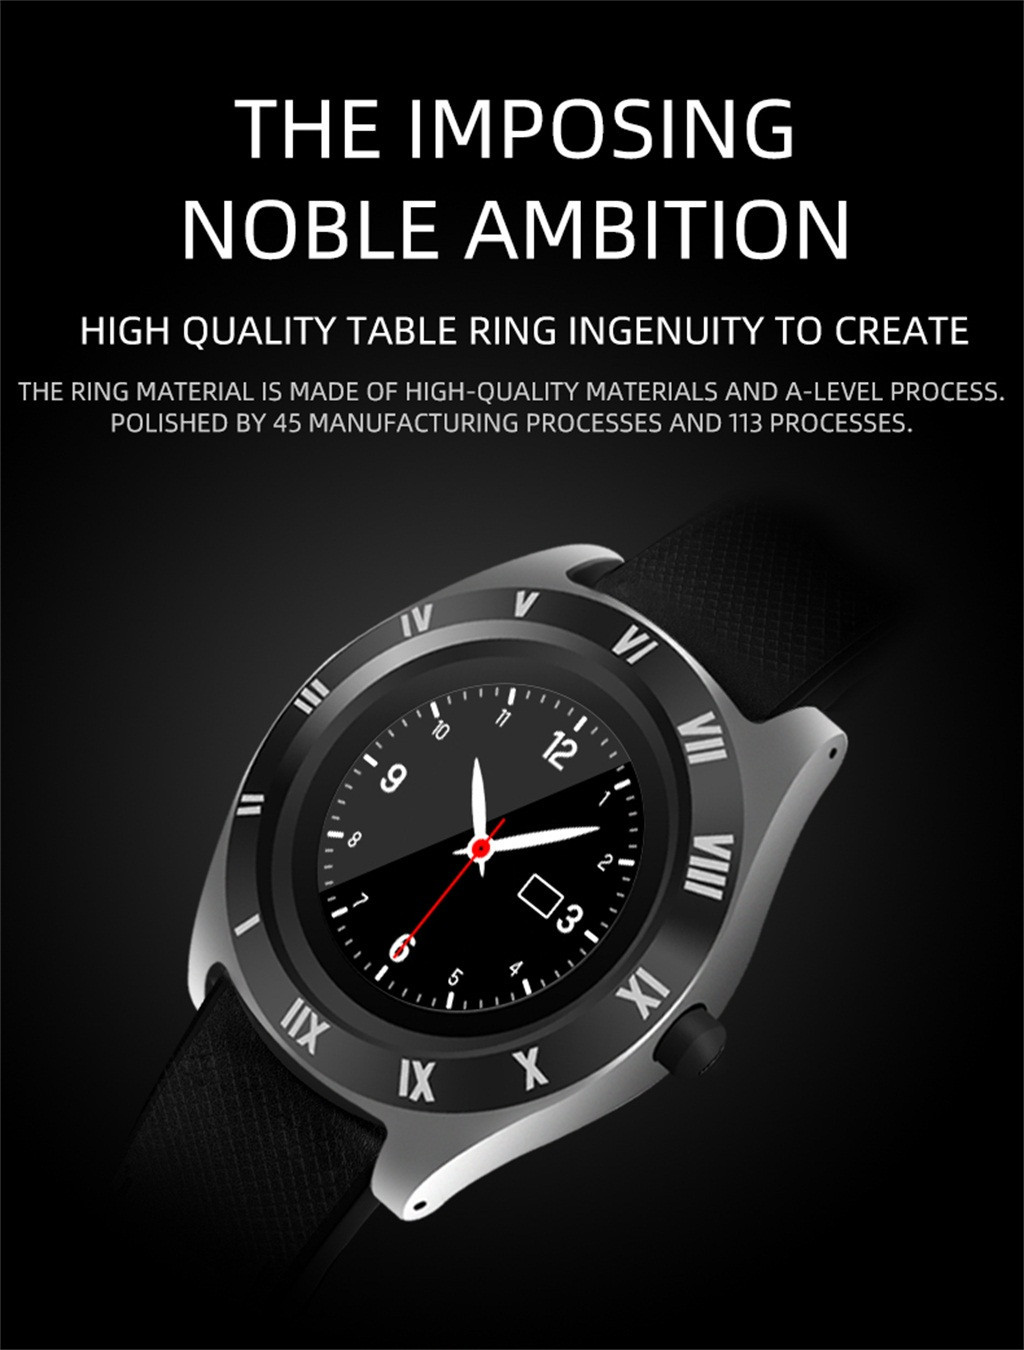 Hot Sale] HIPERDEAL Blueteeth Smart Watch Camera Phone Mate 4G GSM